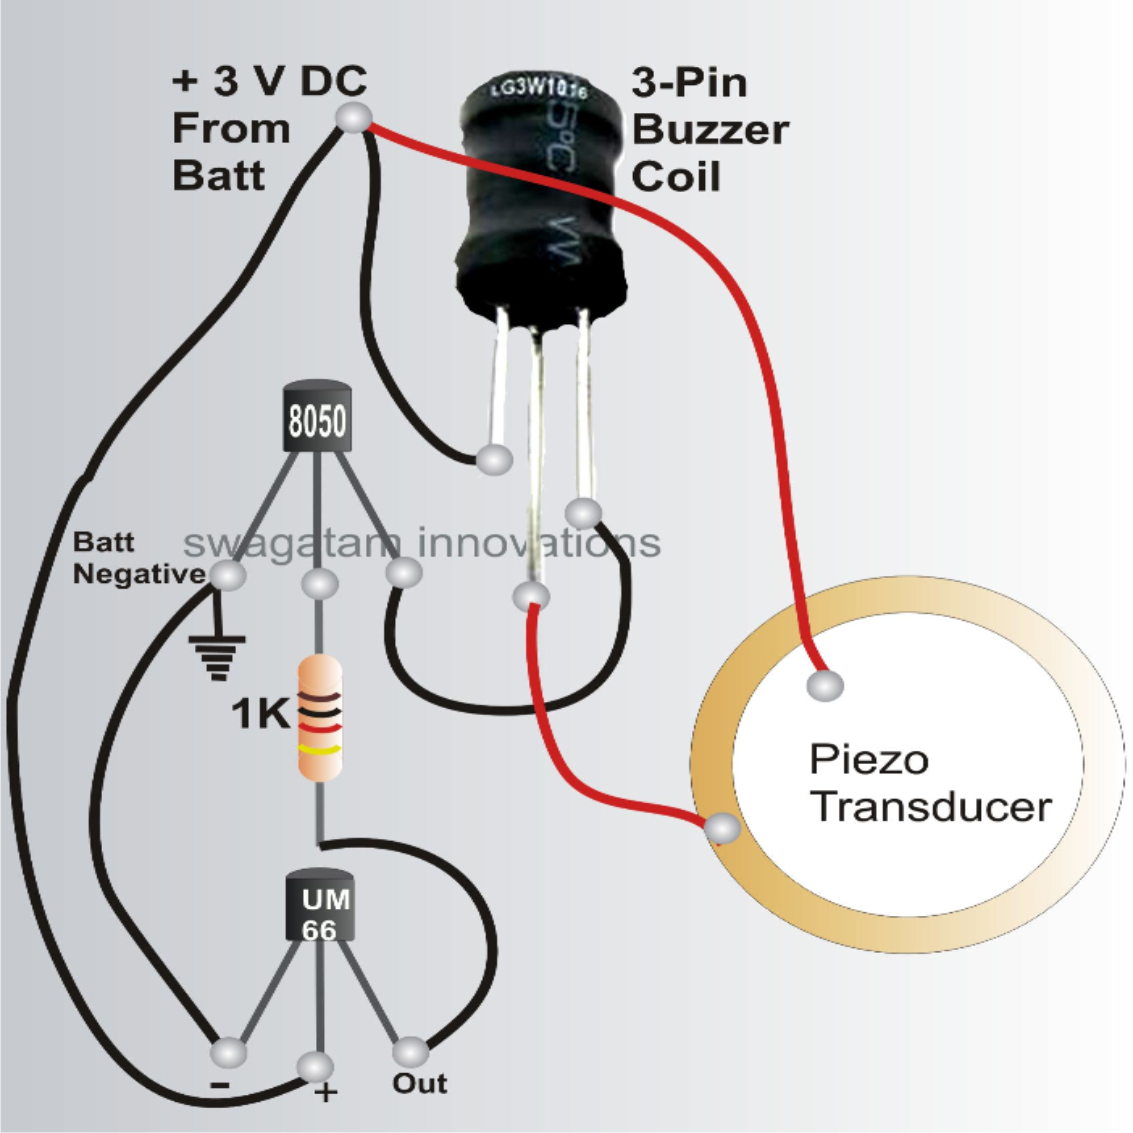 Bicycle Musical Horn Circuit Using 27mm Piezo Transducer And Um66 Additionally Camera Taser Schematics Further Stun Gun Diagram Tone Generator